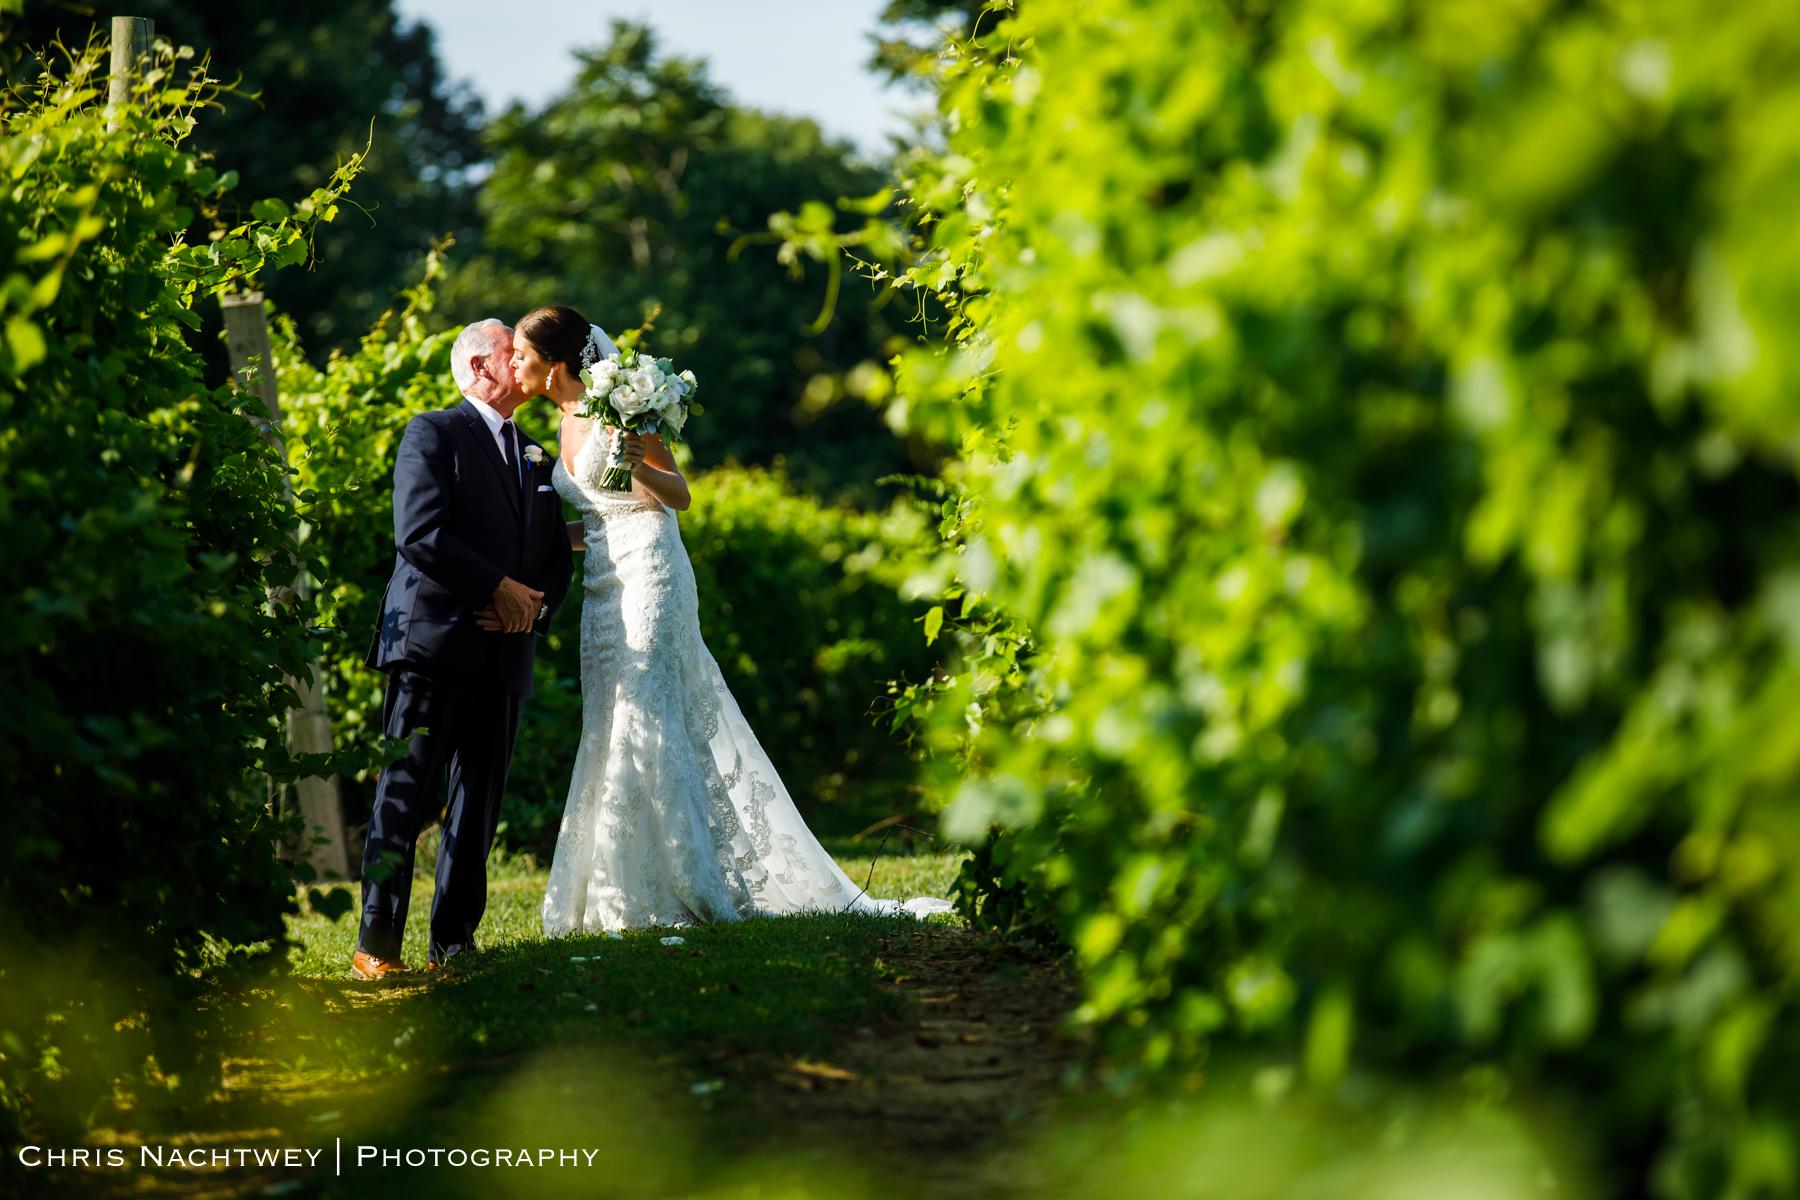 wedding-lake-of-isles-photos-chris-nachtwey-photography-2019-29.jpg